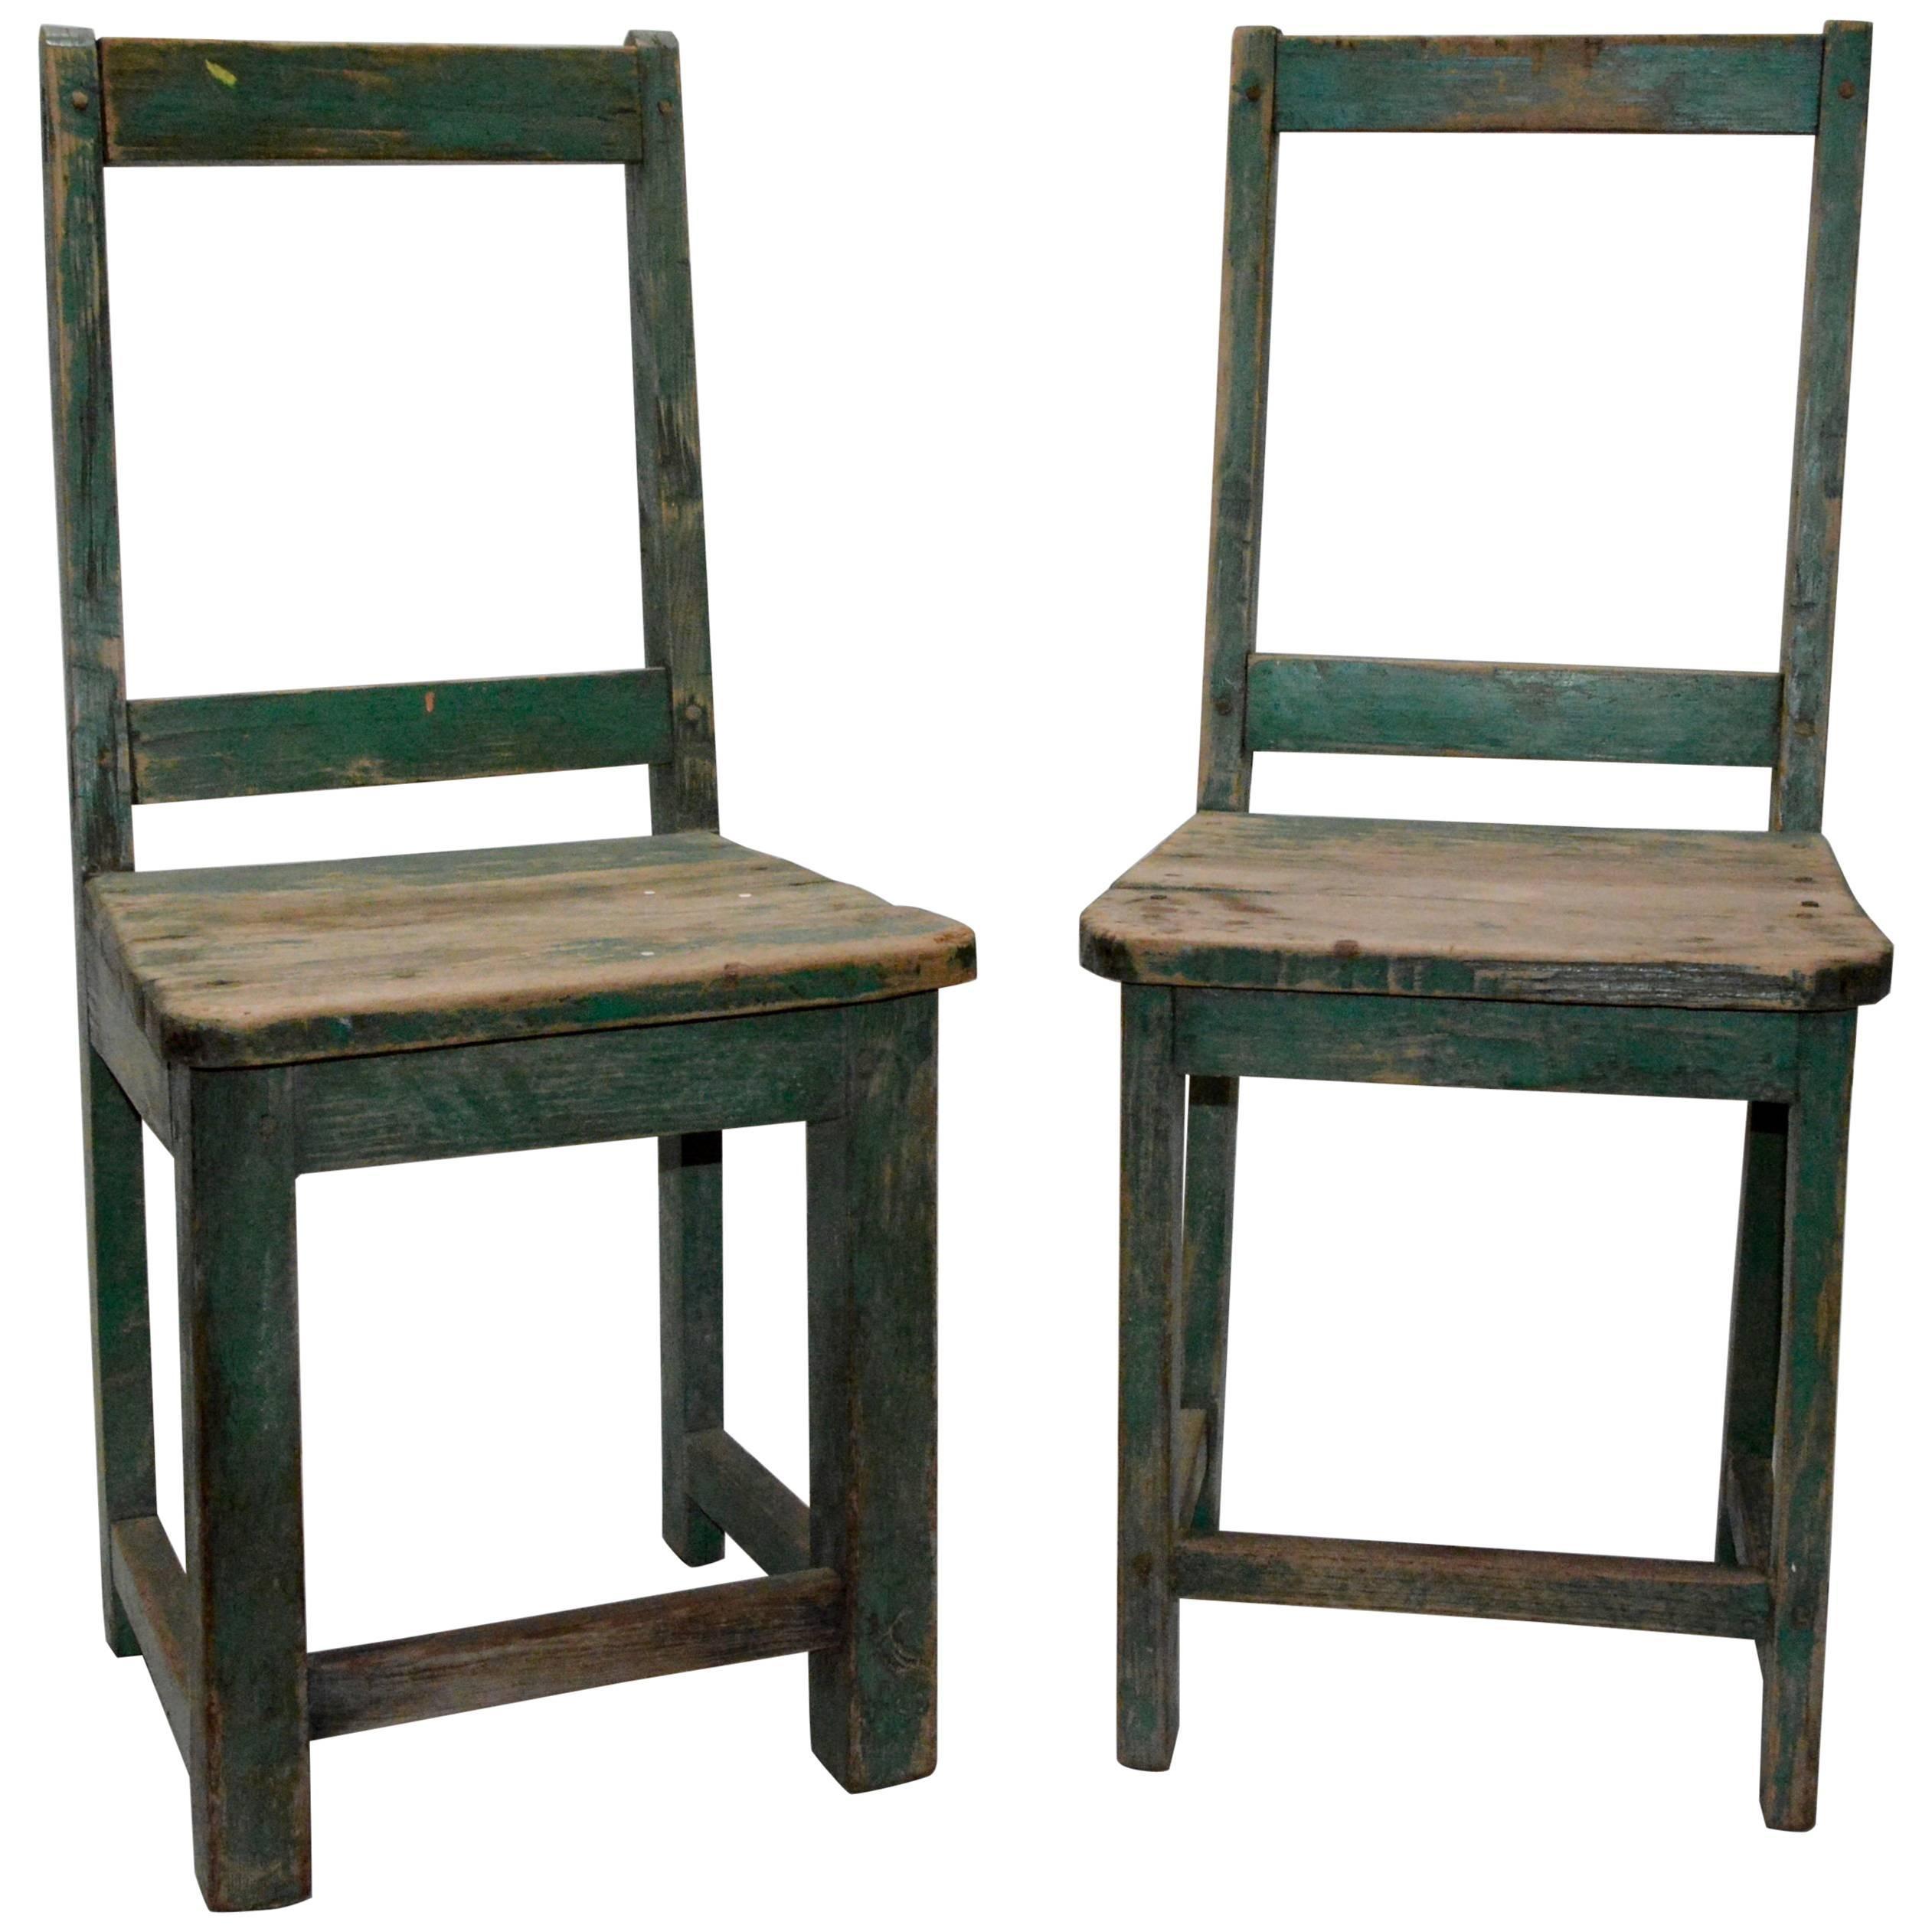 Pair Of Primitive Spanish Folk Art Chairs